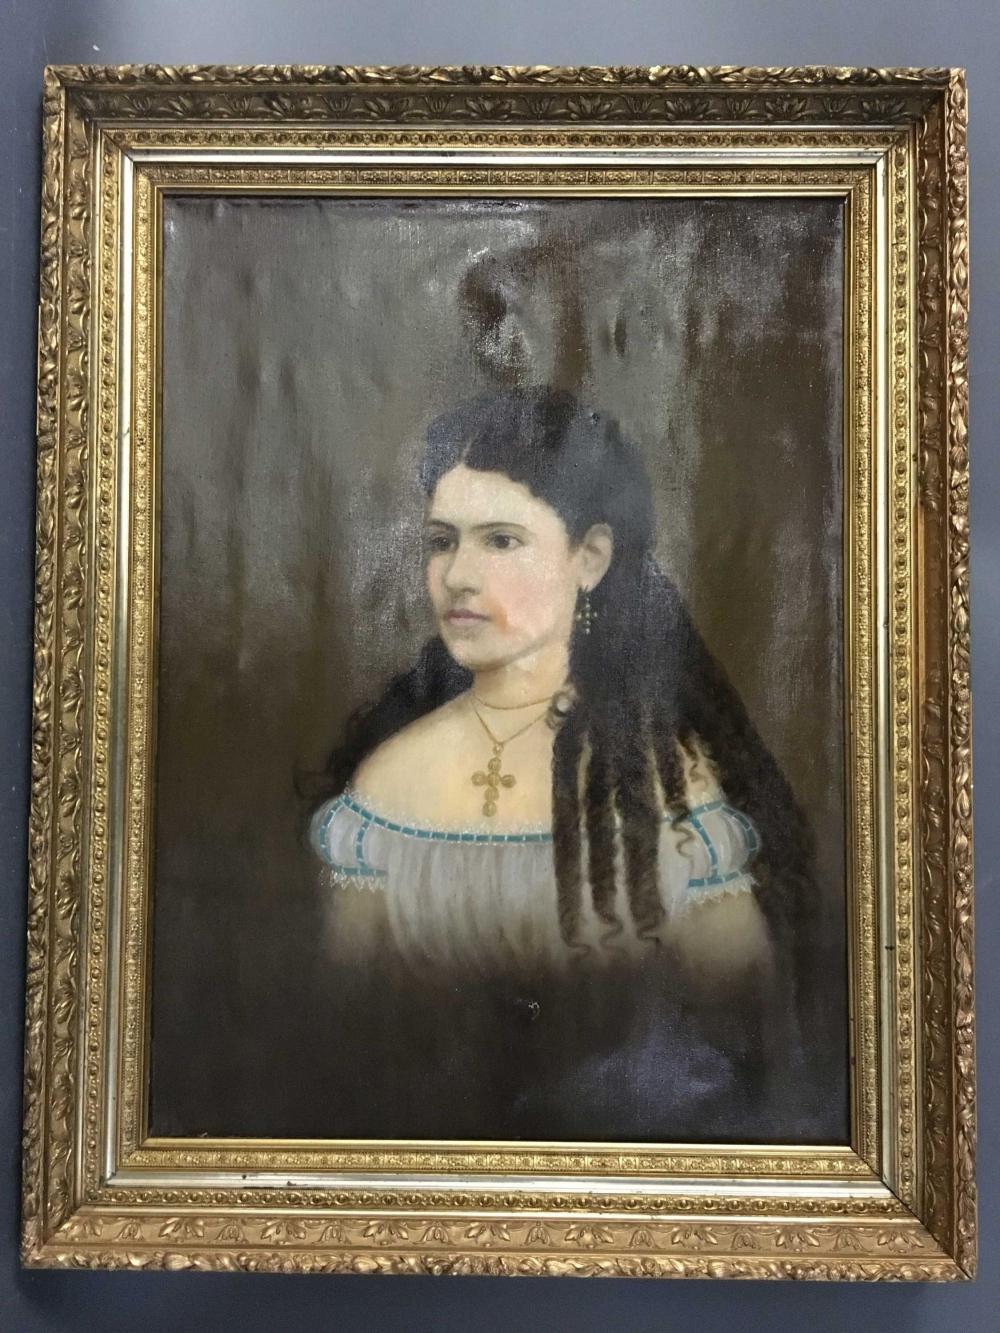 O/C portrait of a woman, c. 1800s, Latin American.